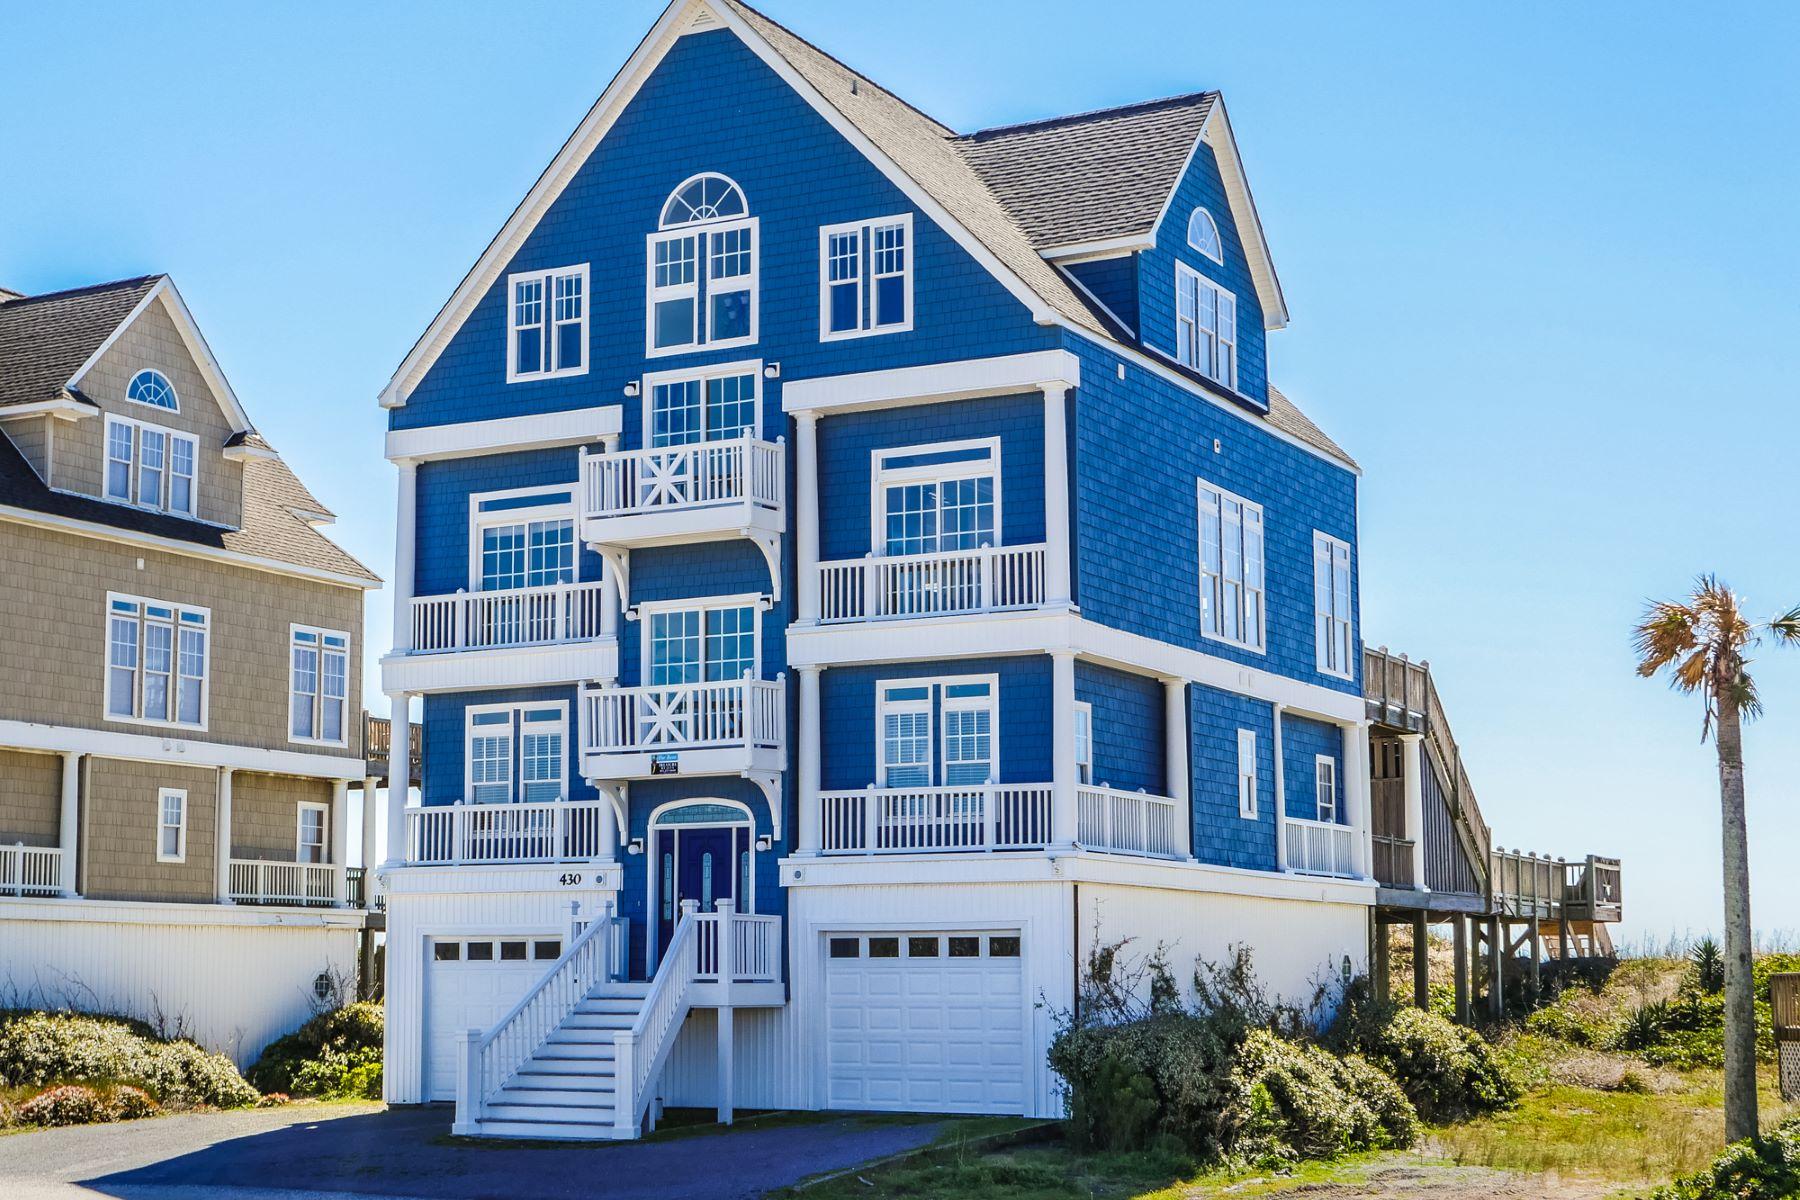 Moradia para Venda às Oceanfront Magnificence 430 New River Inlet Rd N Topsail Beach, Carolina Do Norte, 28460 Estados Unidos